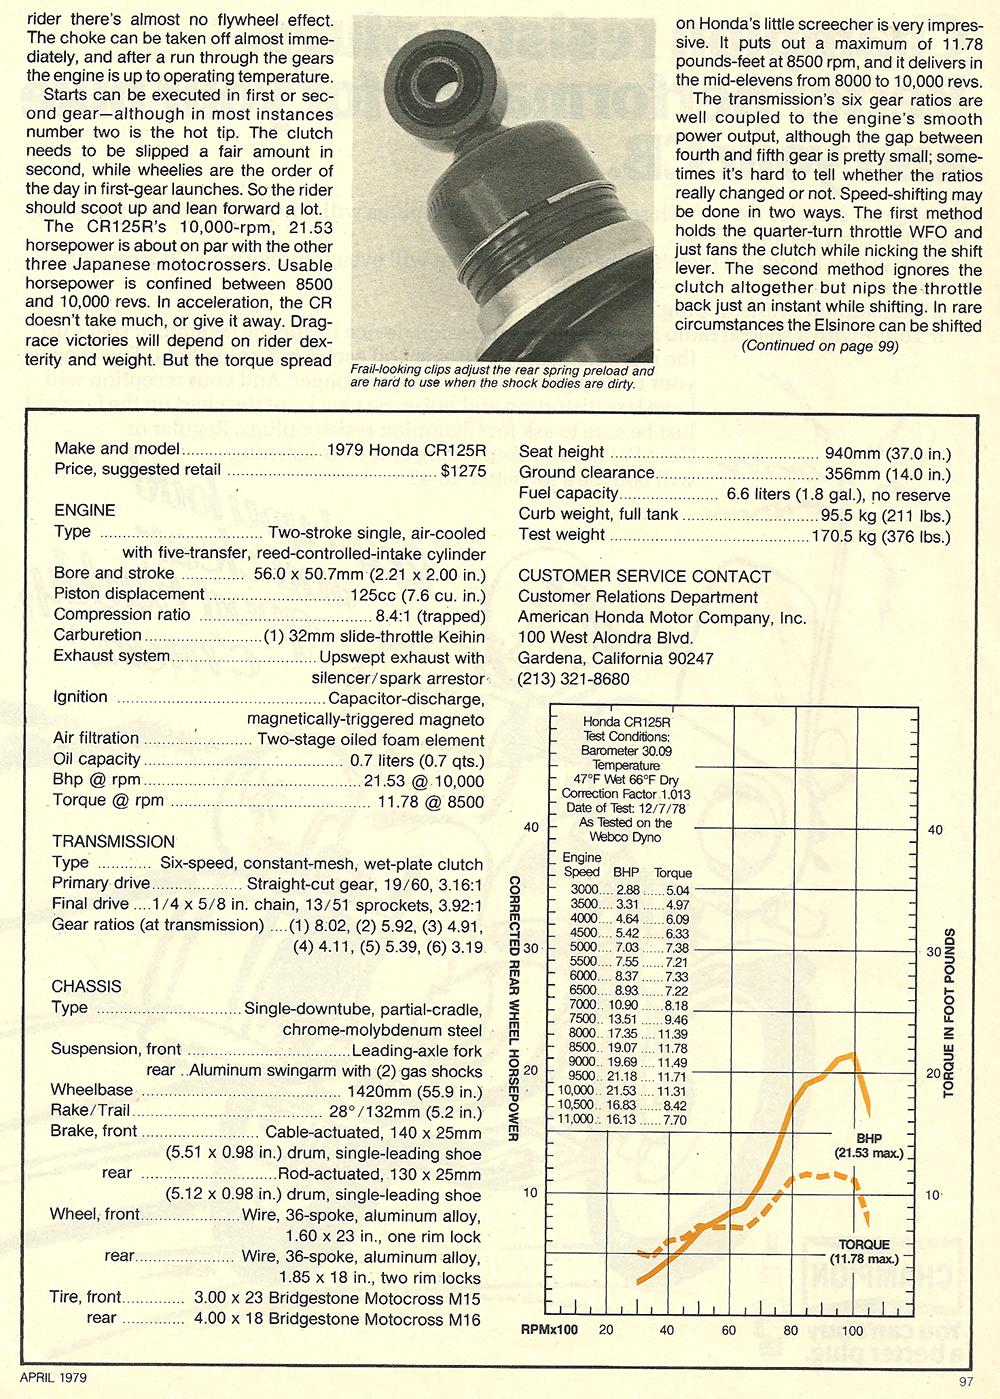 1979 Honda CR125R road test 08.jpg